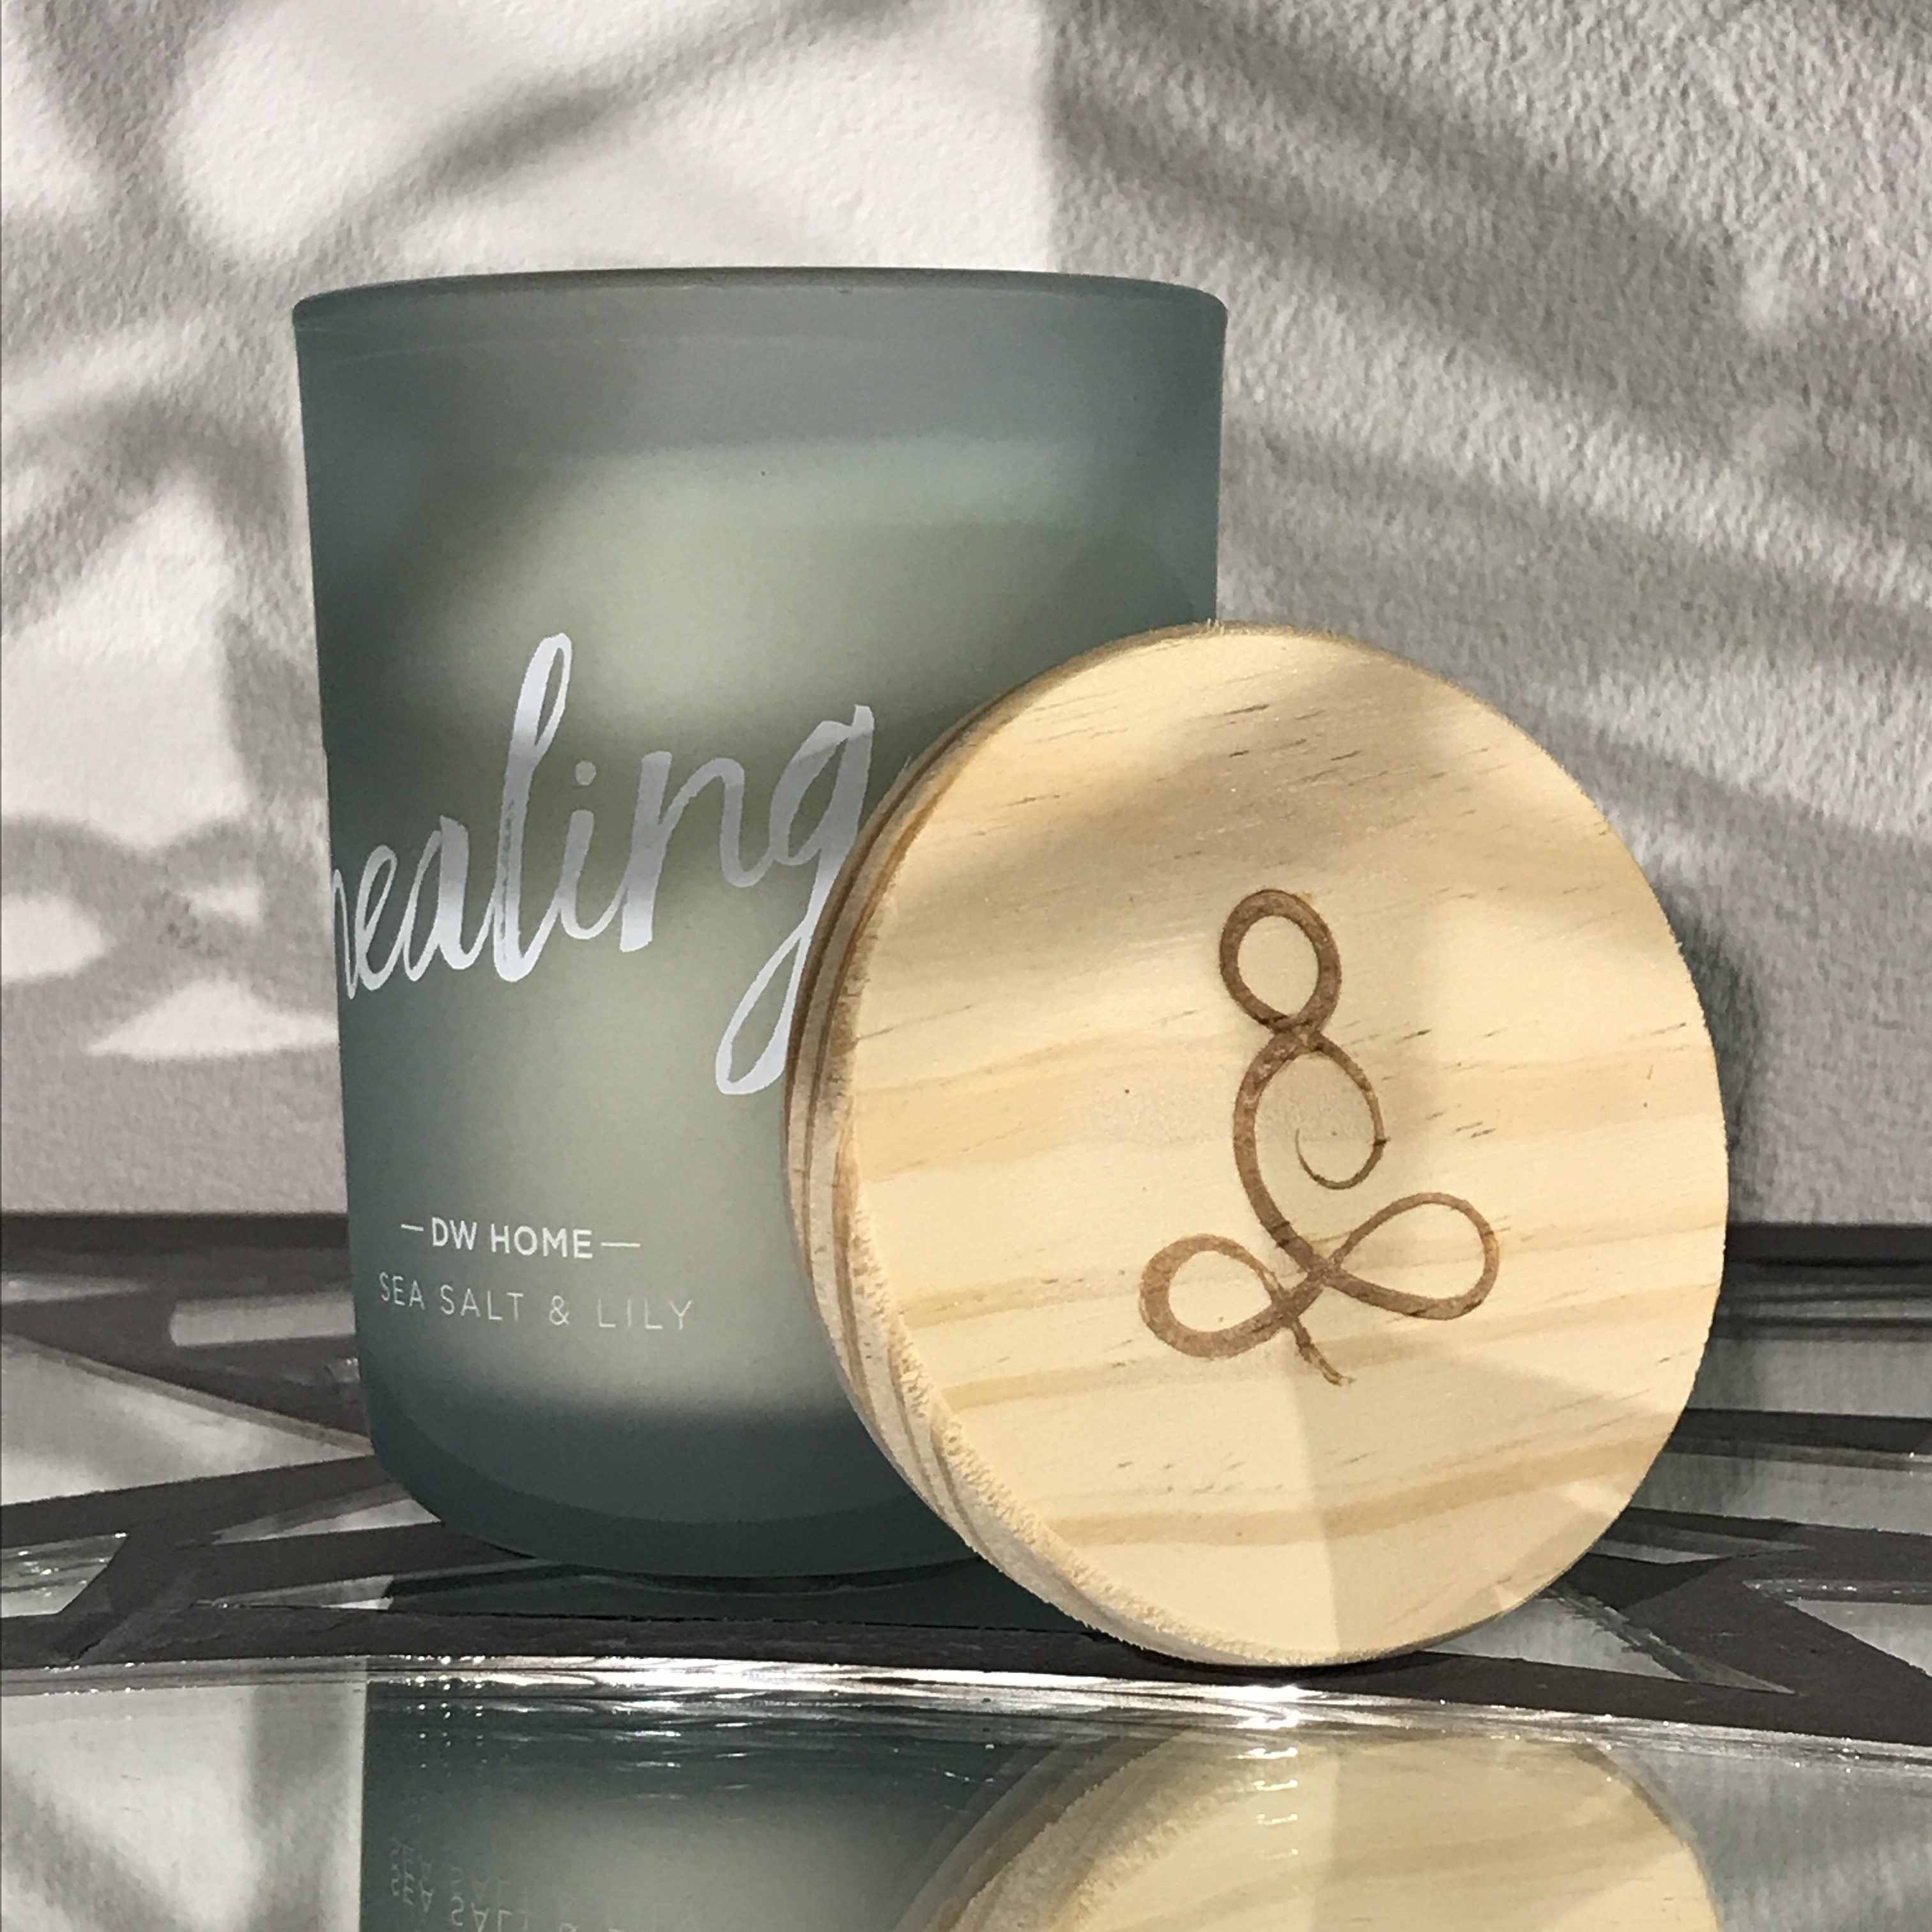 【DW Home Candles】healing (SEA SALT & LILY)